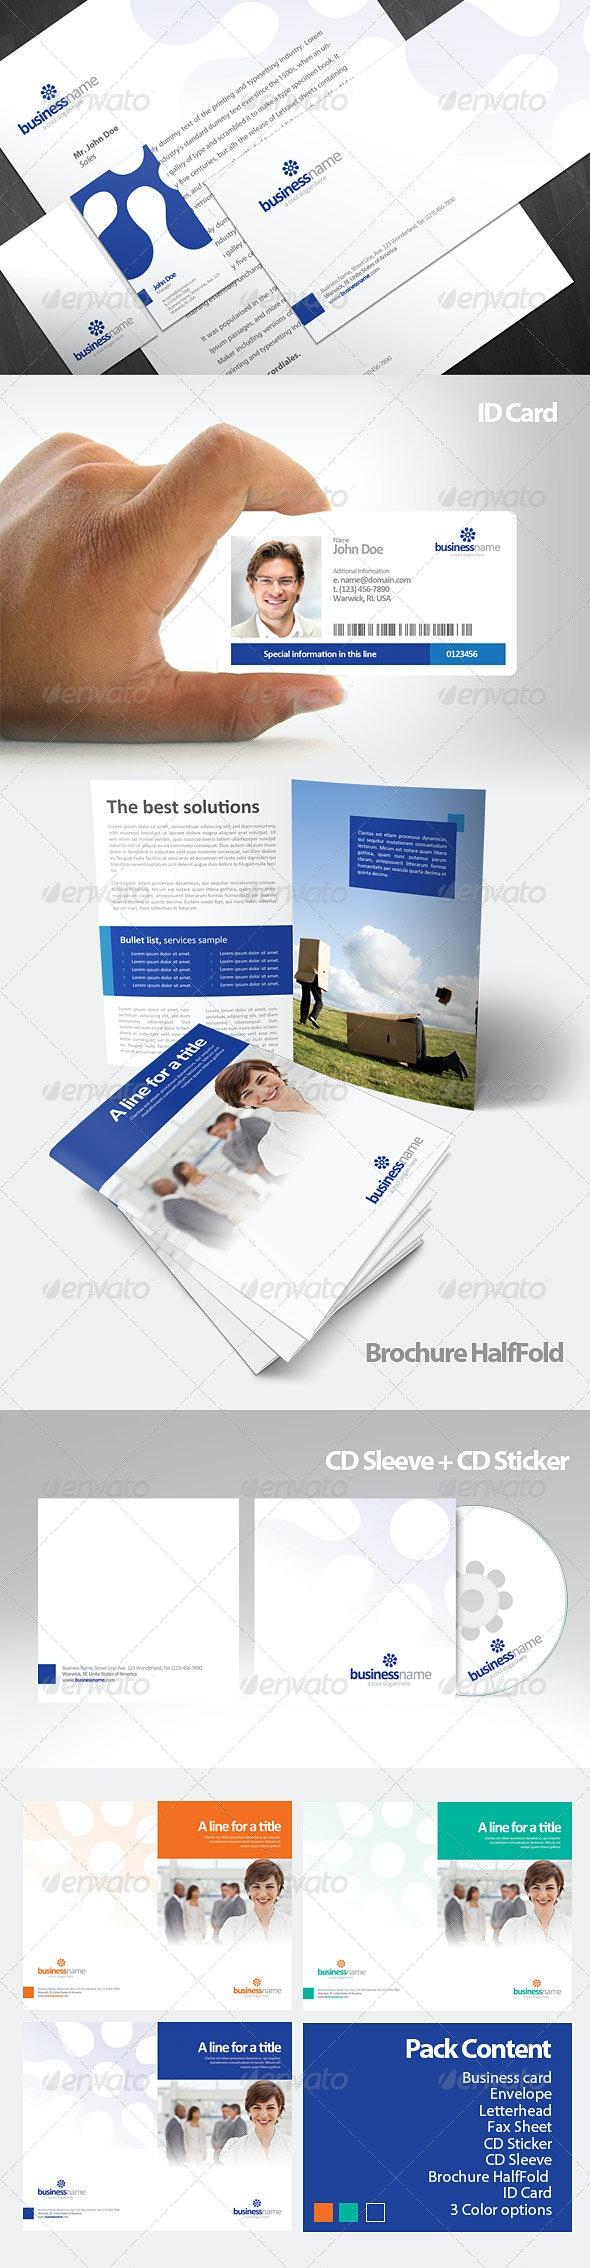 Katra Corporate Identity Pack - Stationery Print Templates